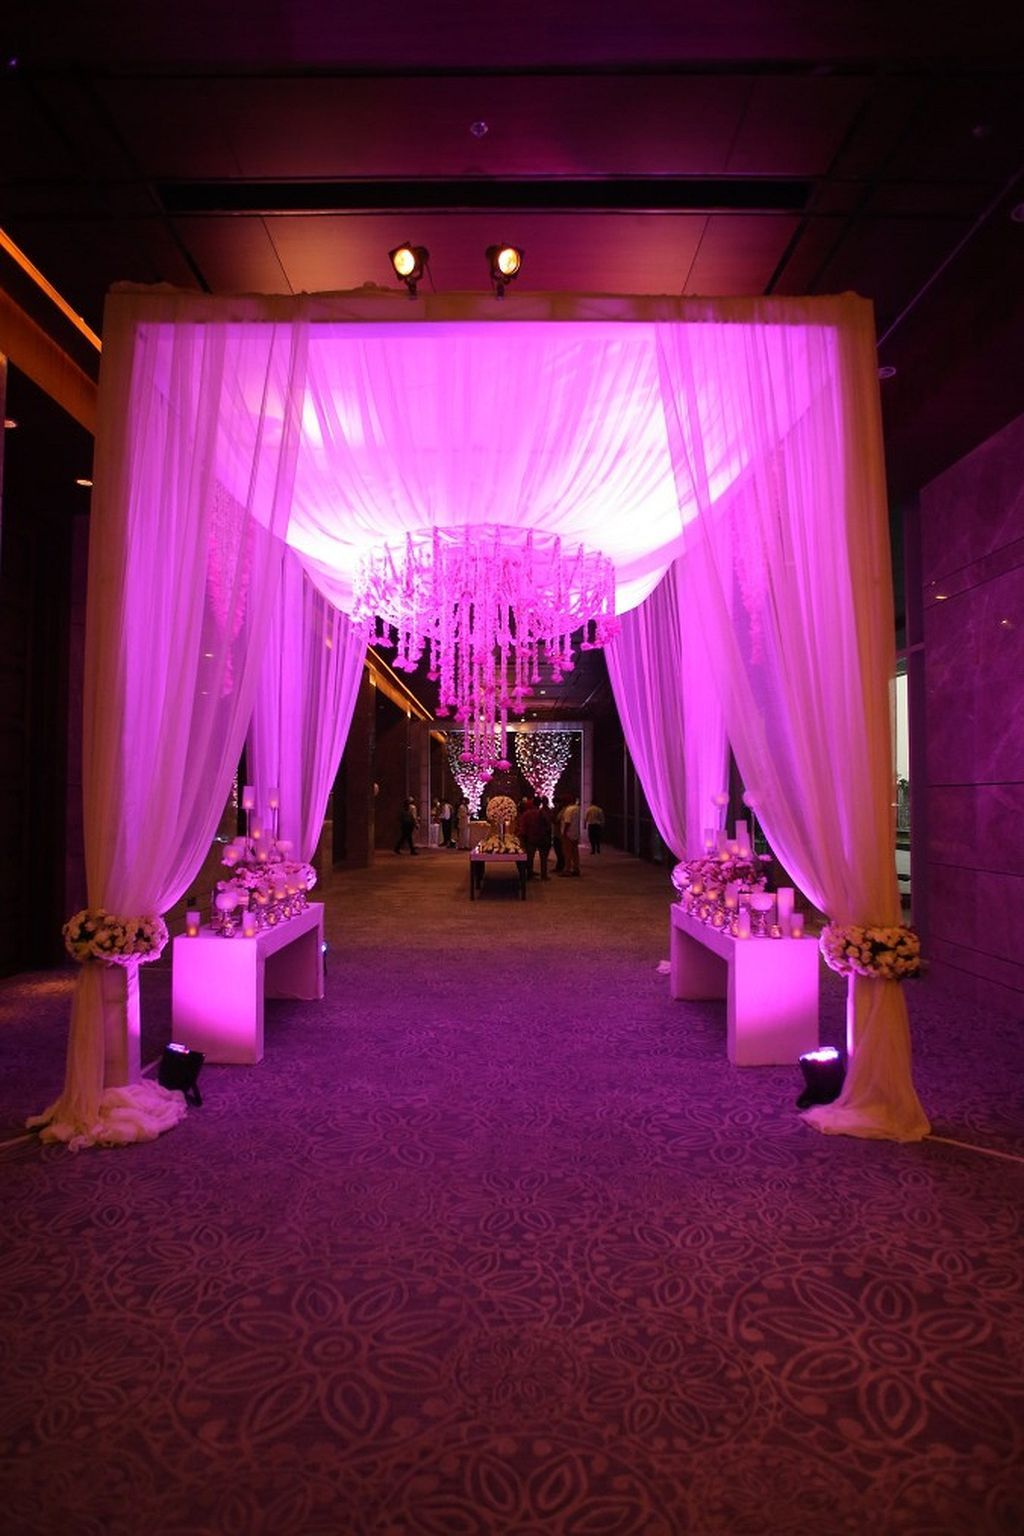 Awesome 30 Beautiful Wedding Entrance Decor Ideas Https Weddmagz